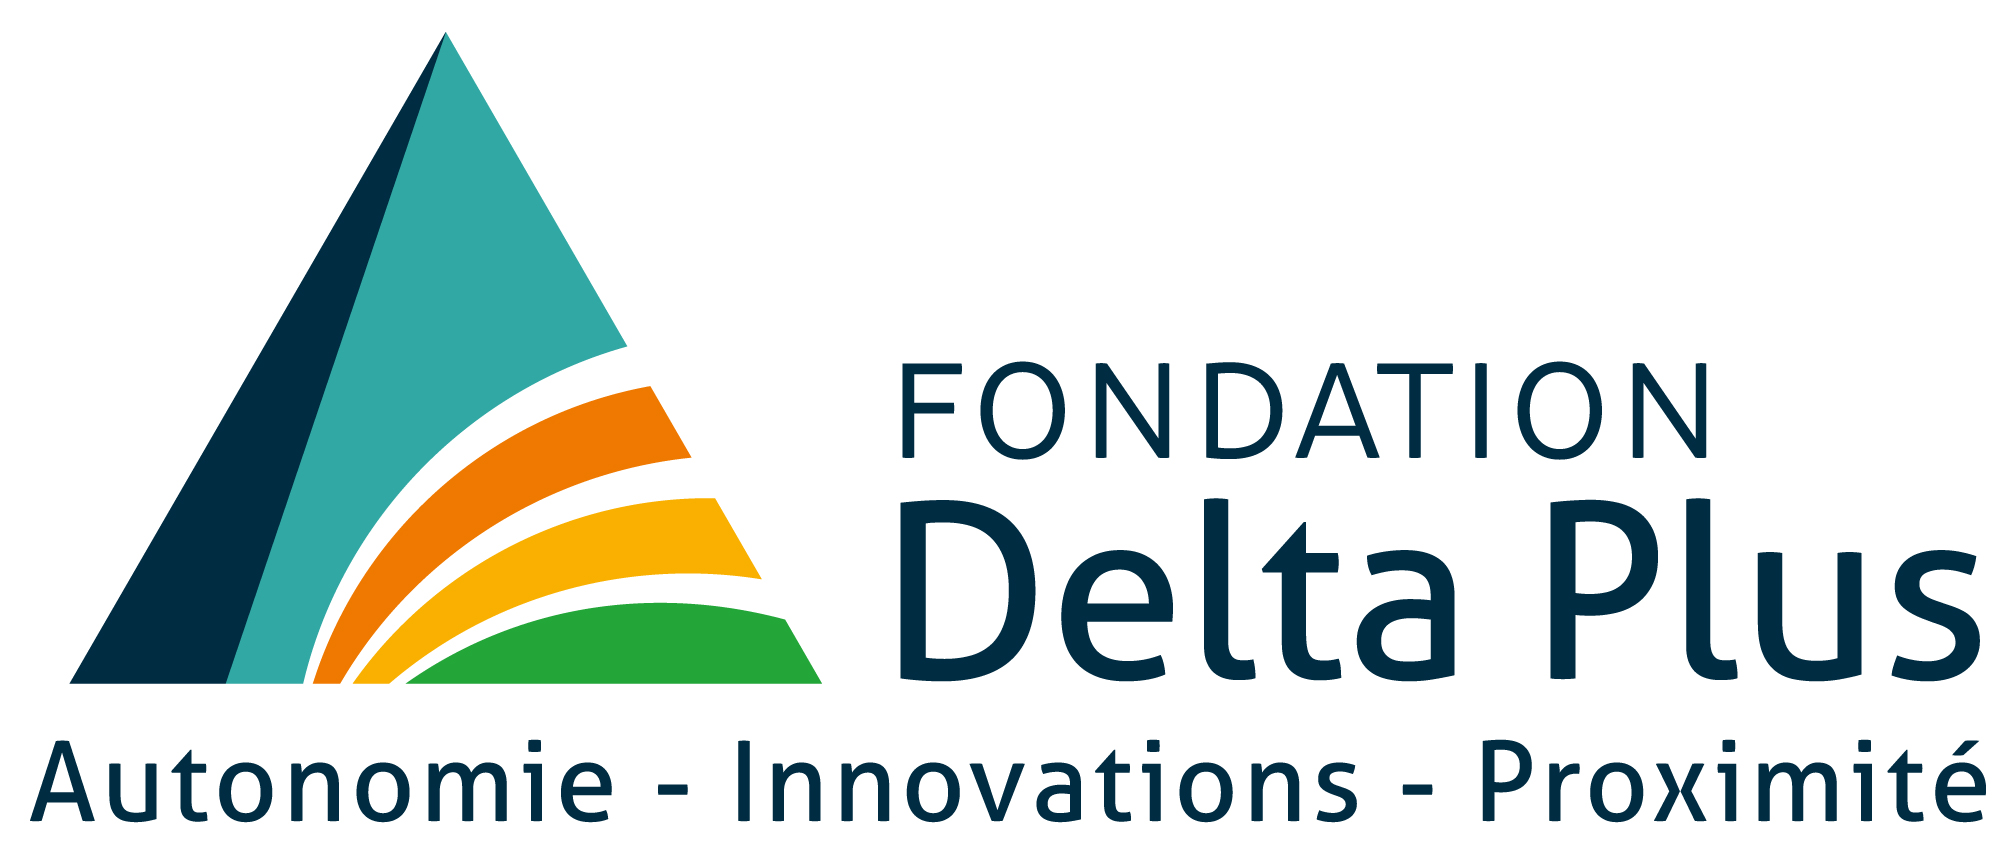 Fondation Delta Plus